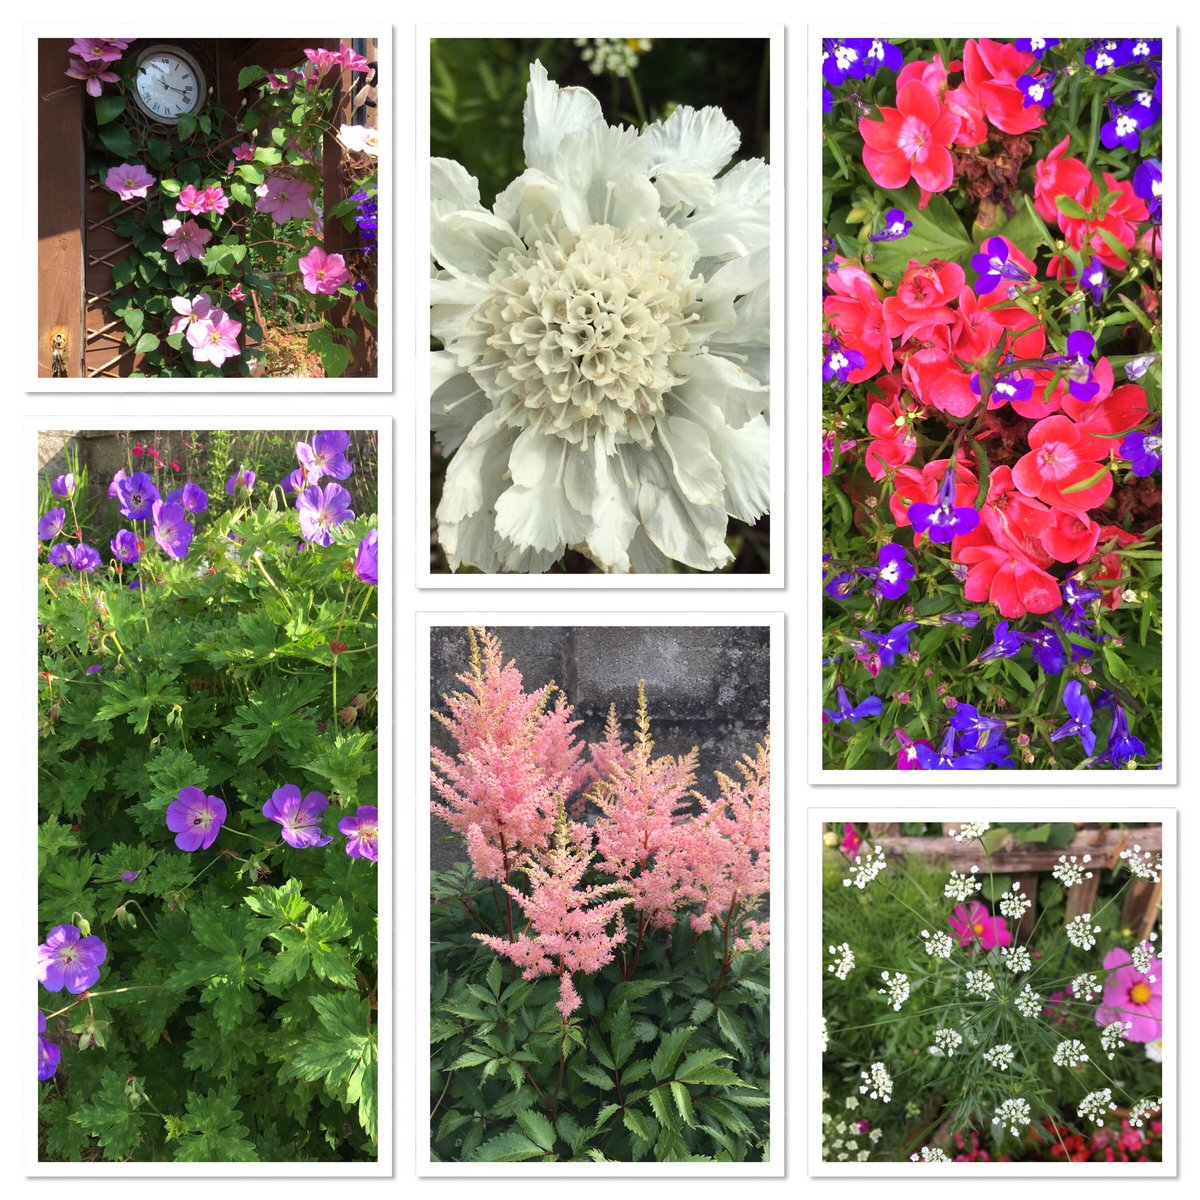 #sixonsaturday Clematis, scabious, lobelia, hardy geranium, astilbe, ammi majus